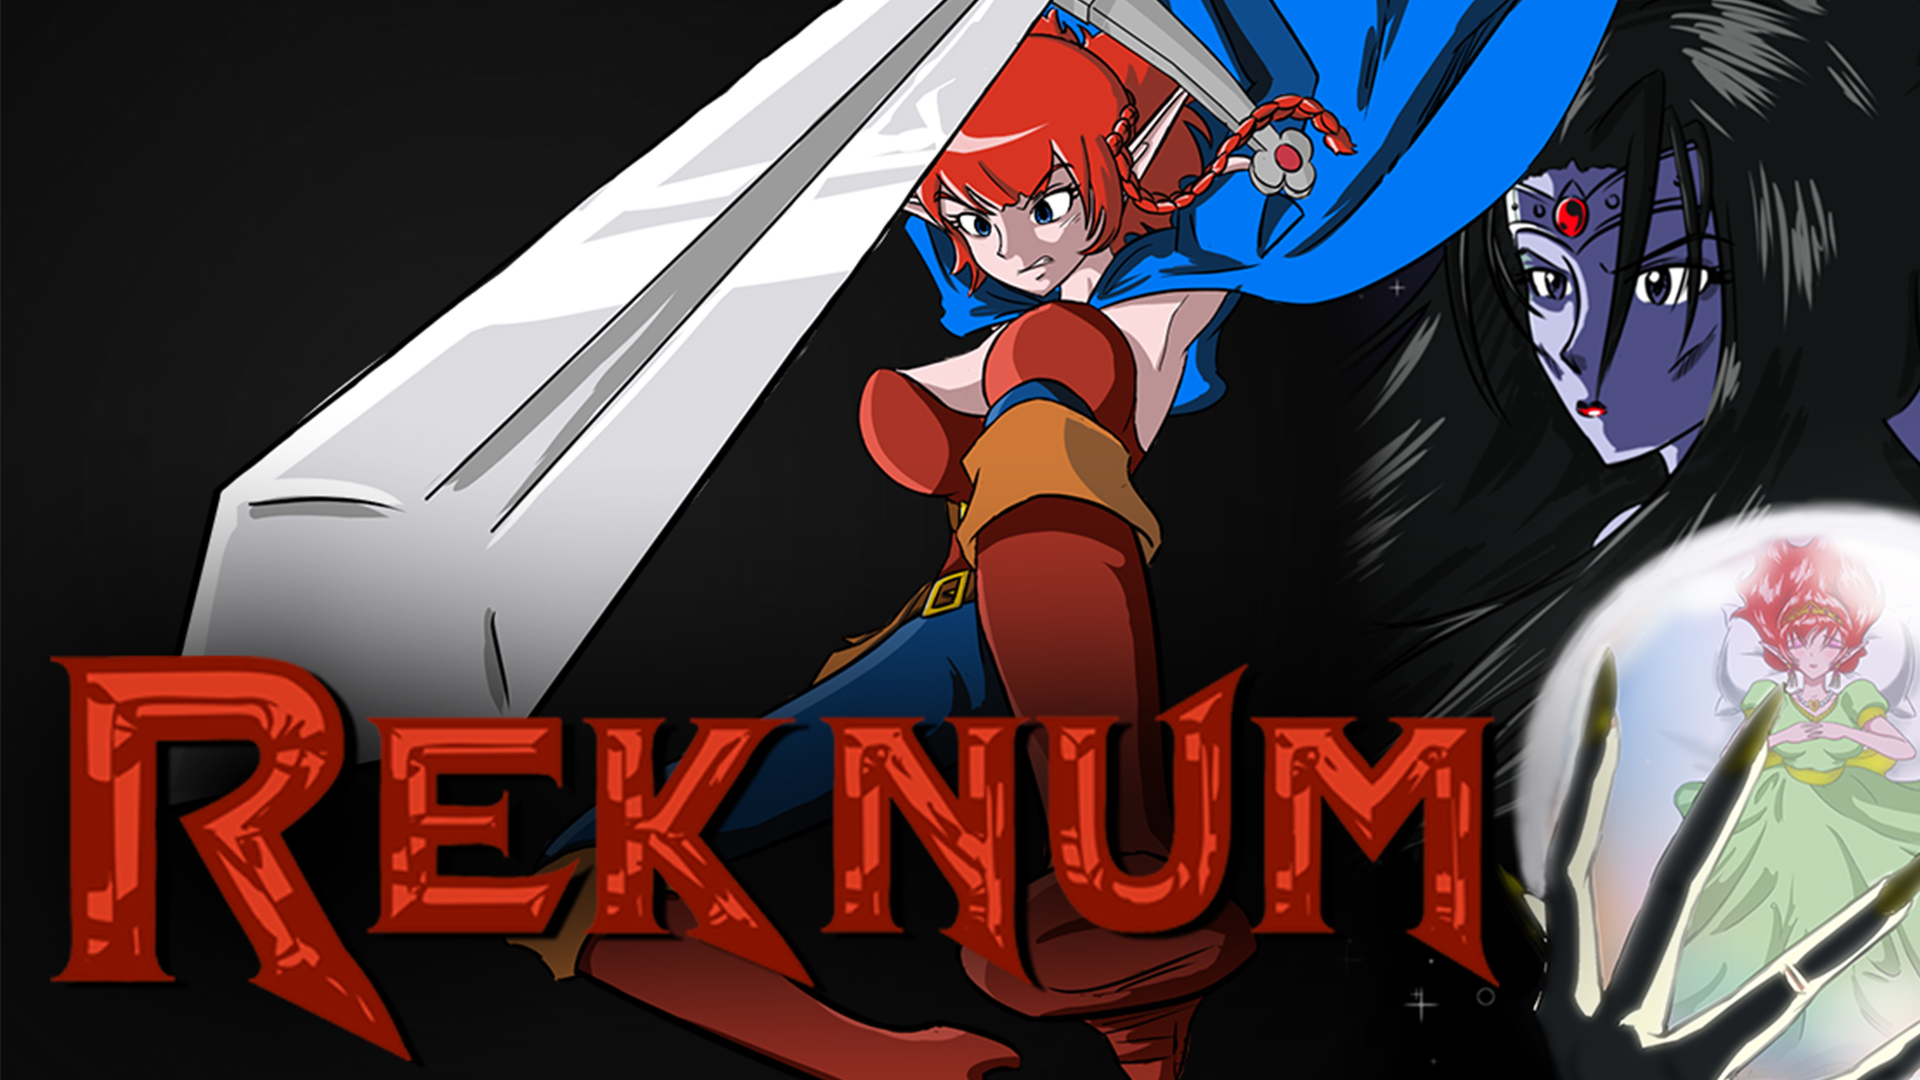 Reknum GameDev